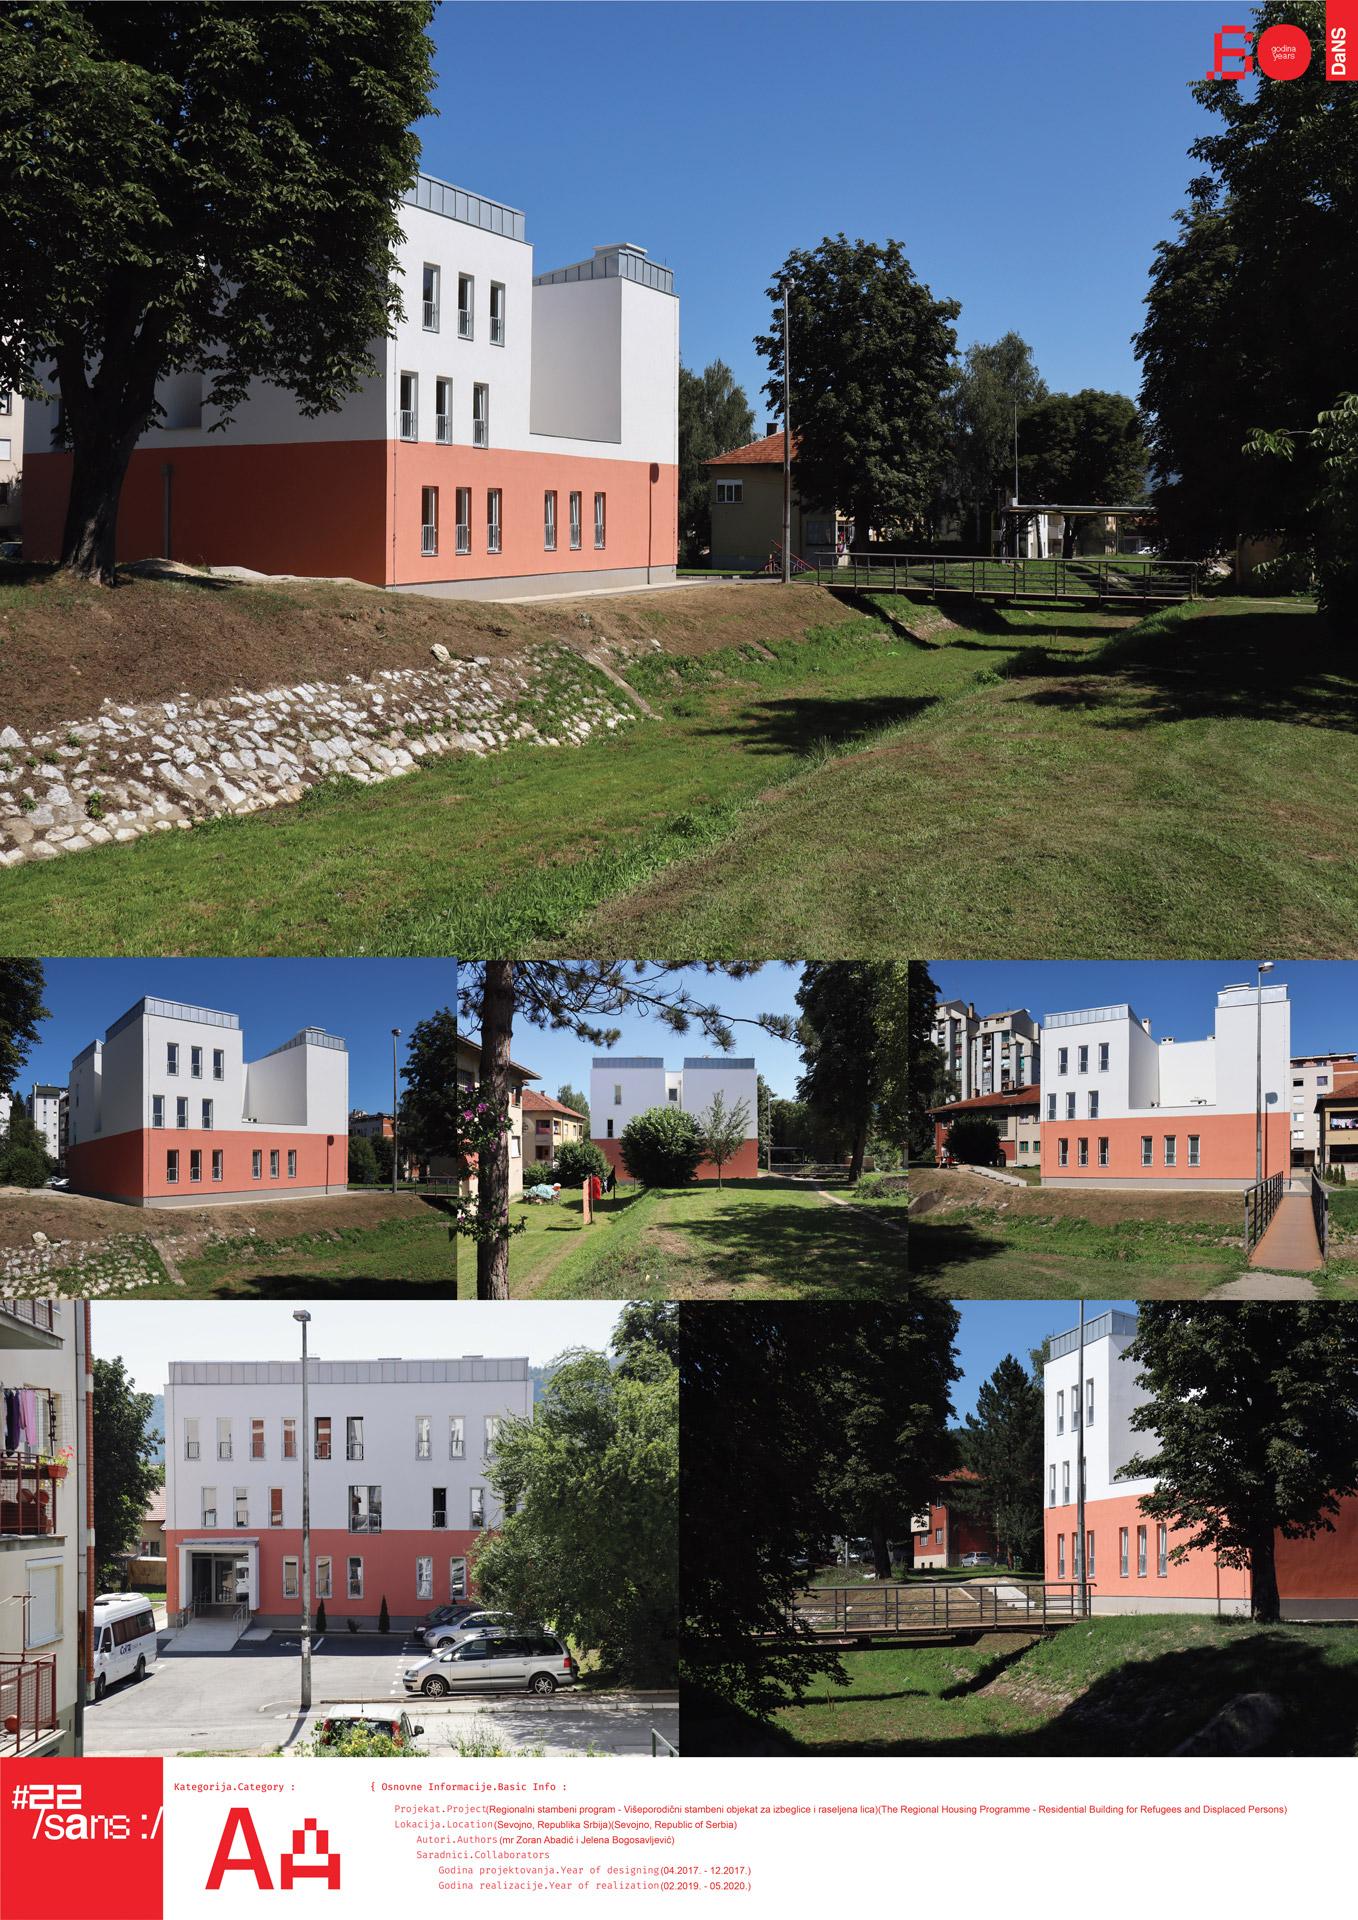 "<p class=""naslov-br"">aa13</p>Višeporodični stambeni objekat za izbeglice i raseljena lica // The Regional Housing Programme – Residental Building for Refugees and Displaced Persons"